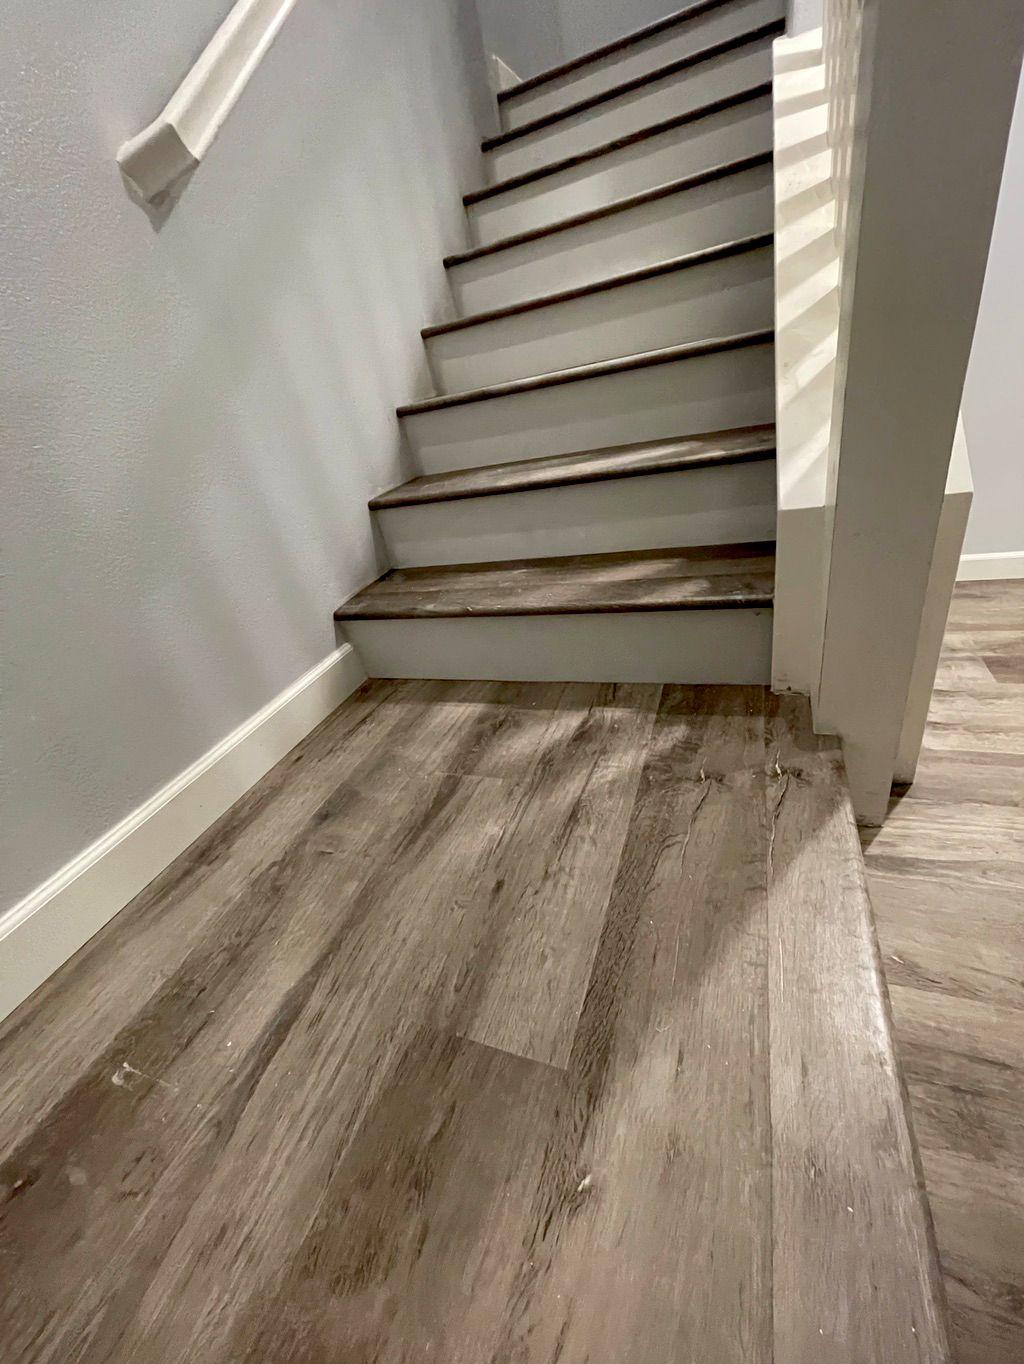 Floor Installation or Replacement - Ontario 2021